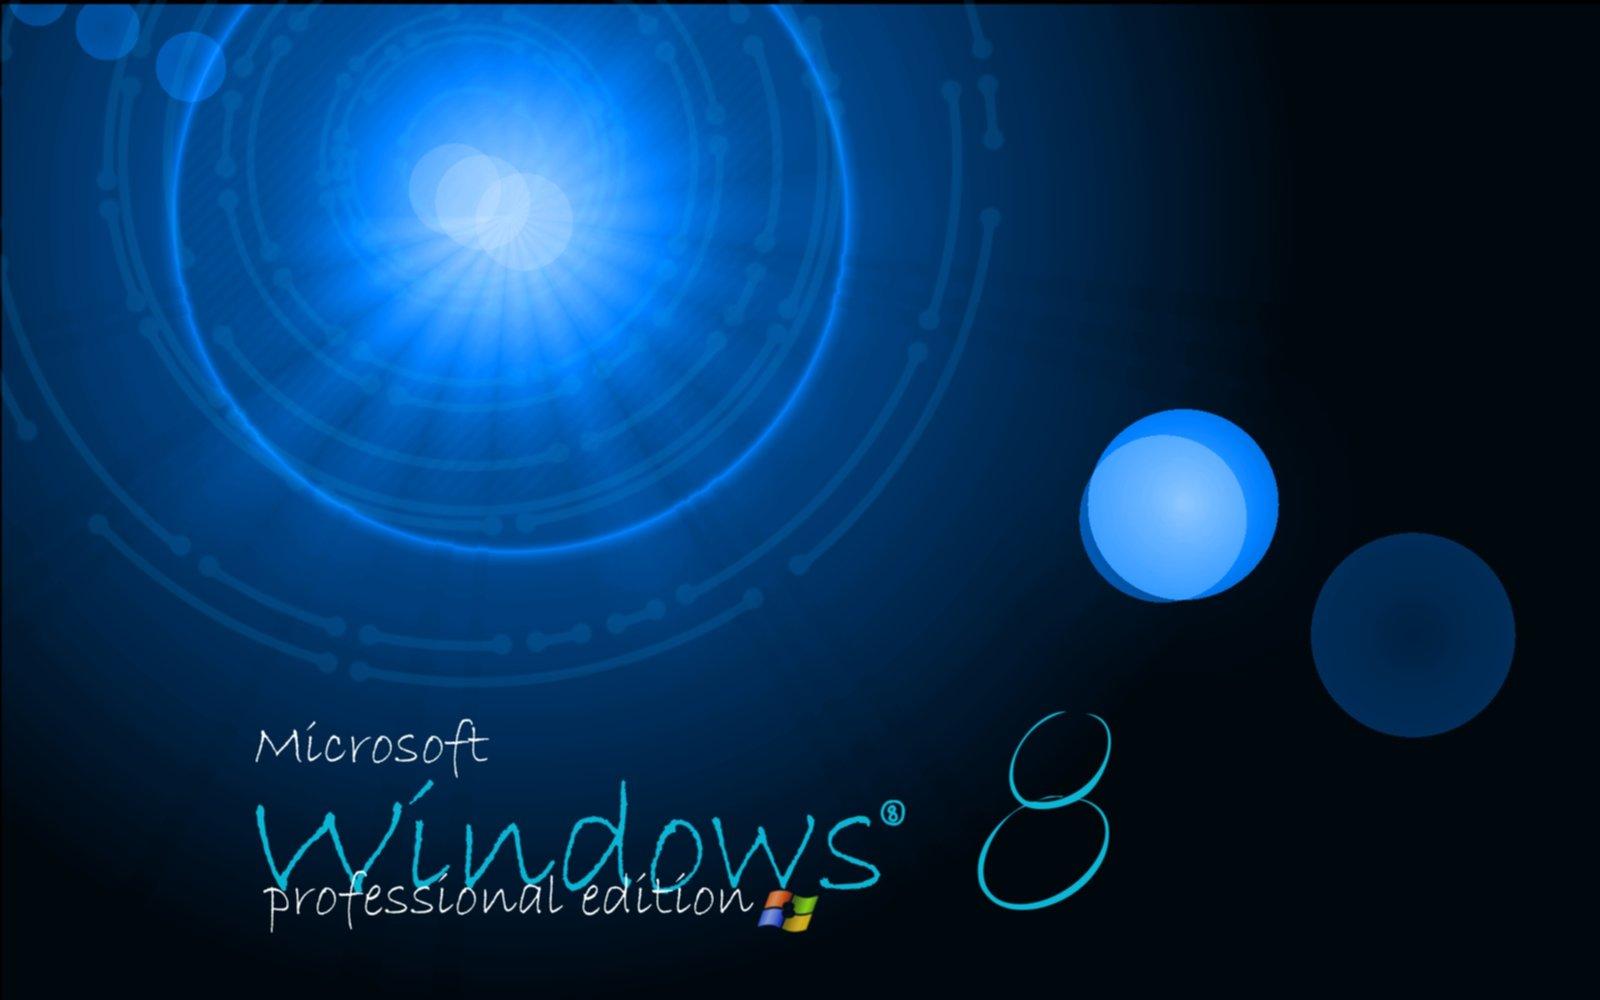 fantasy background for windows 8